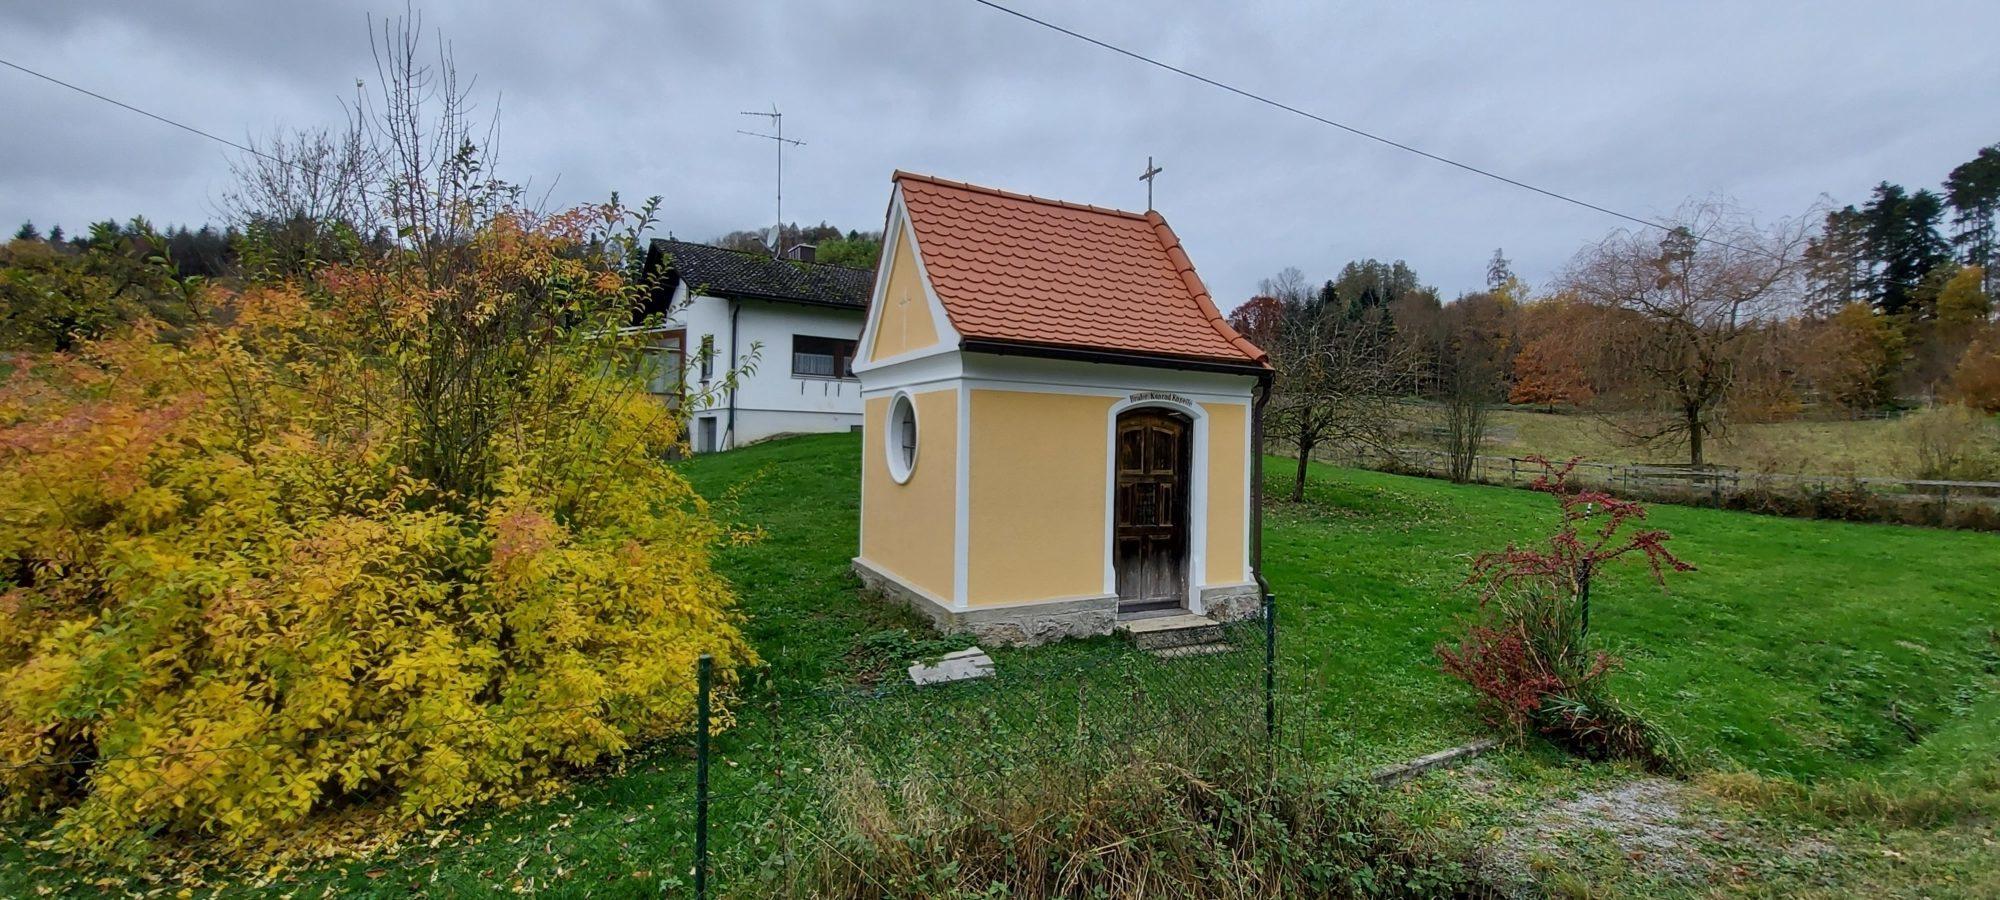 We Konradkapelle